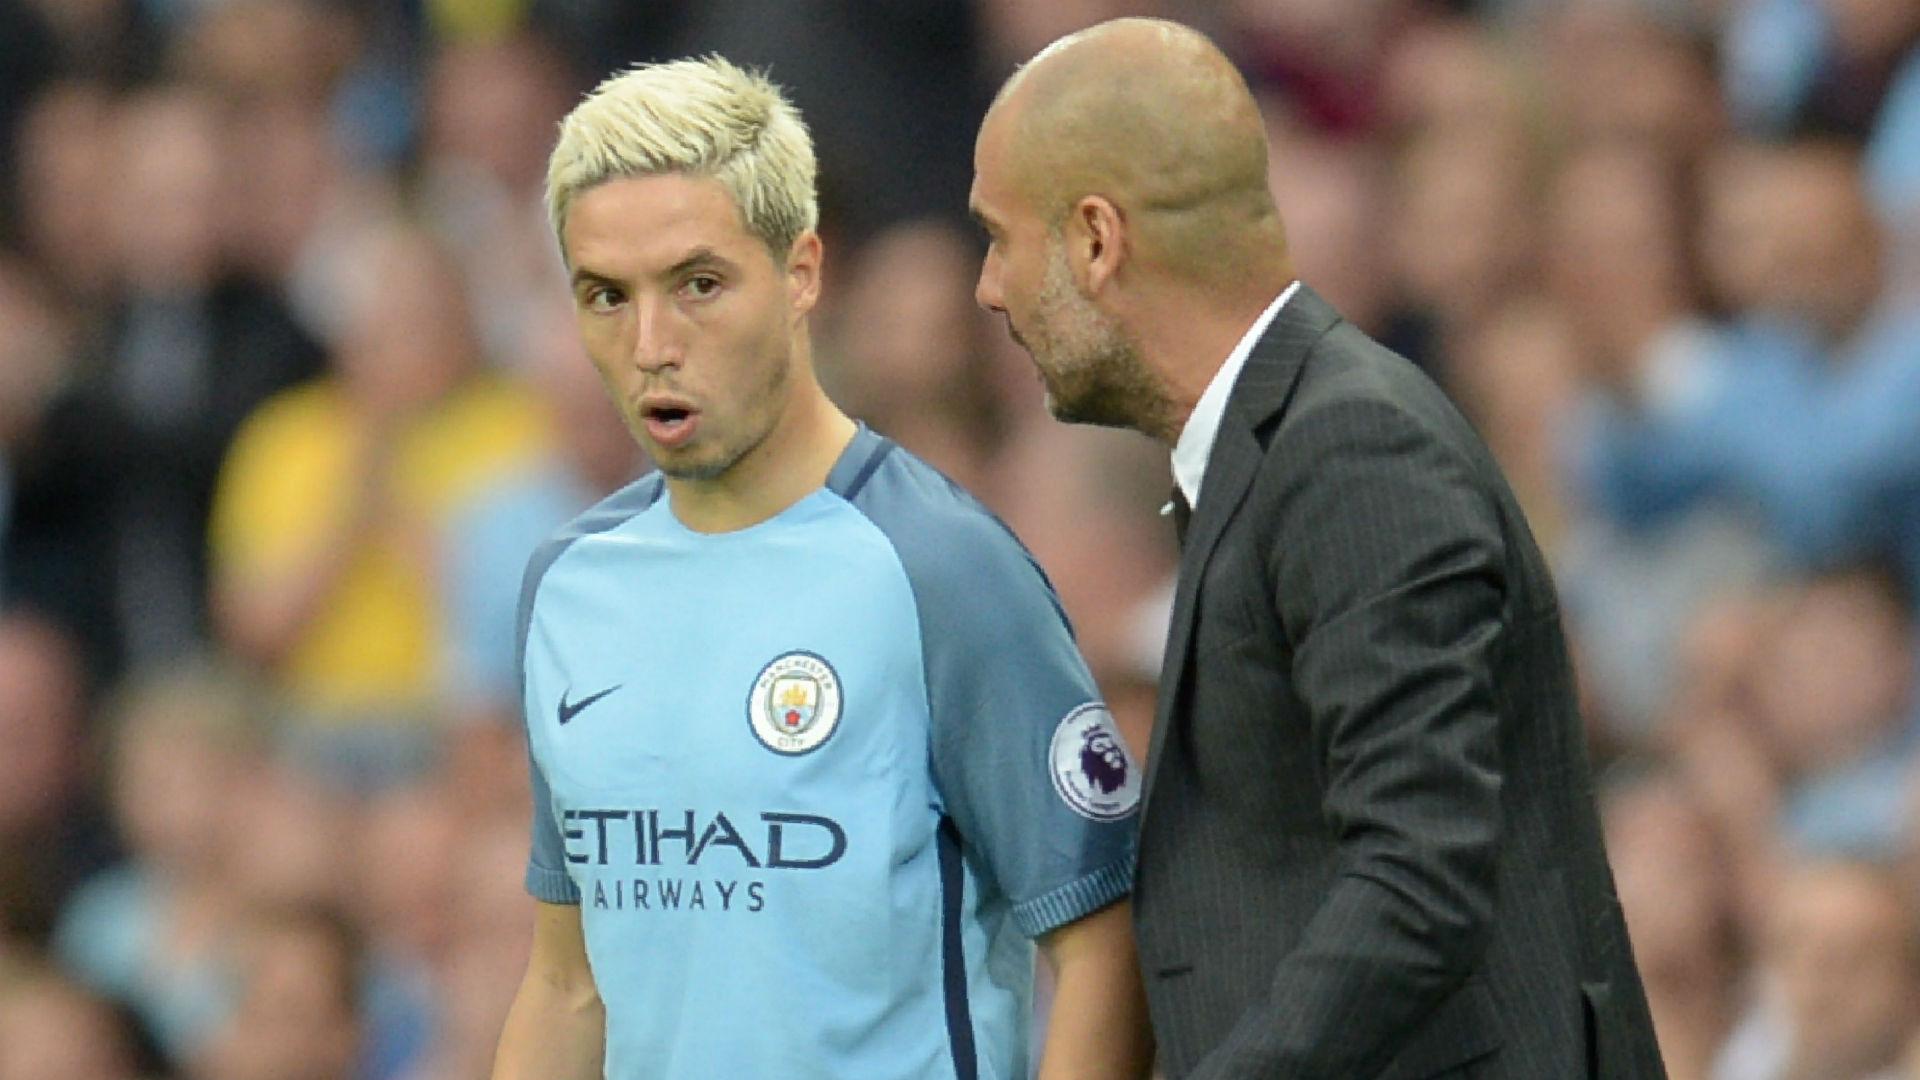 No sex after midnight for Manchester City stars - Samir Nasri